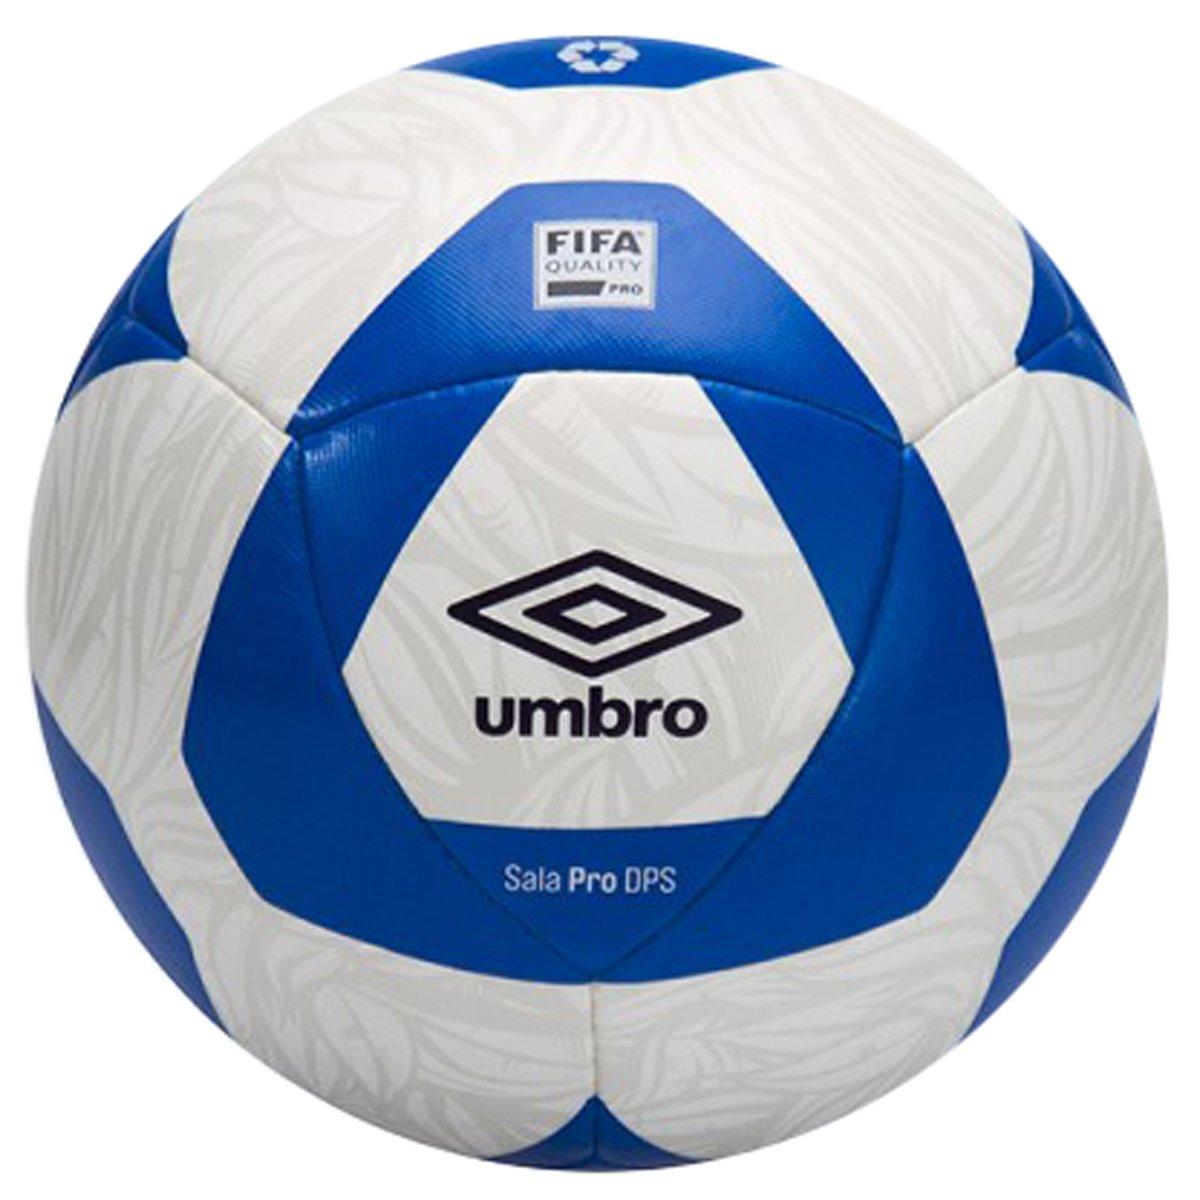 78b59e962eec4 Bola Futsal Umbro Sala Pro 1P8020 273 - Branco Azul - Botas Online ...